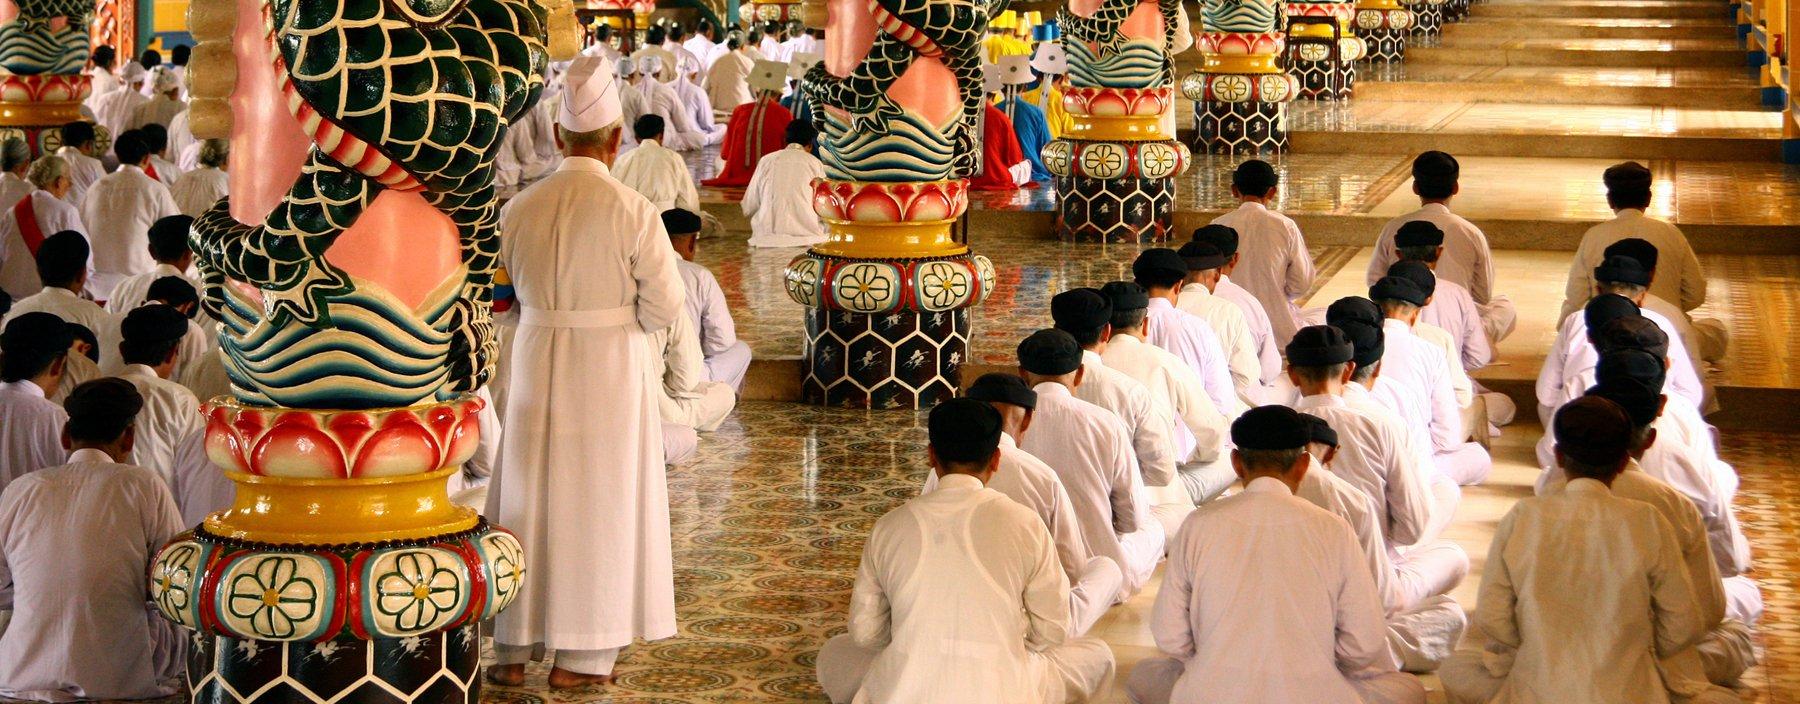 vn, ho chi minh city, cao dai great tempel (19).jpg